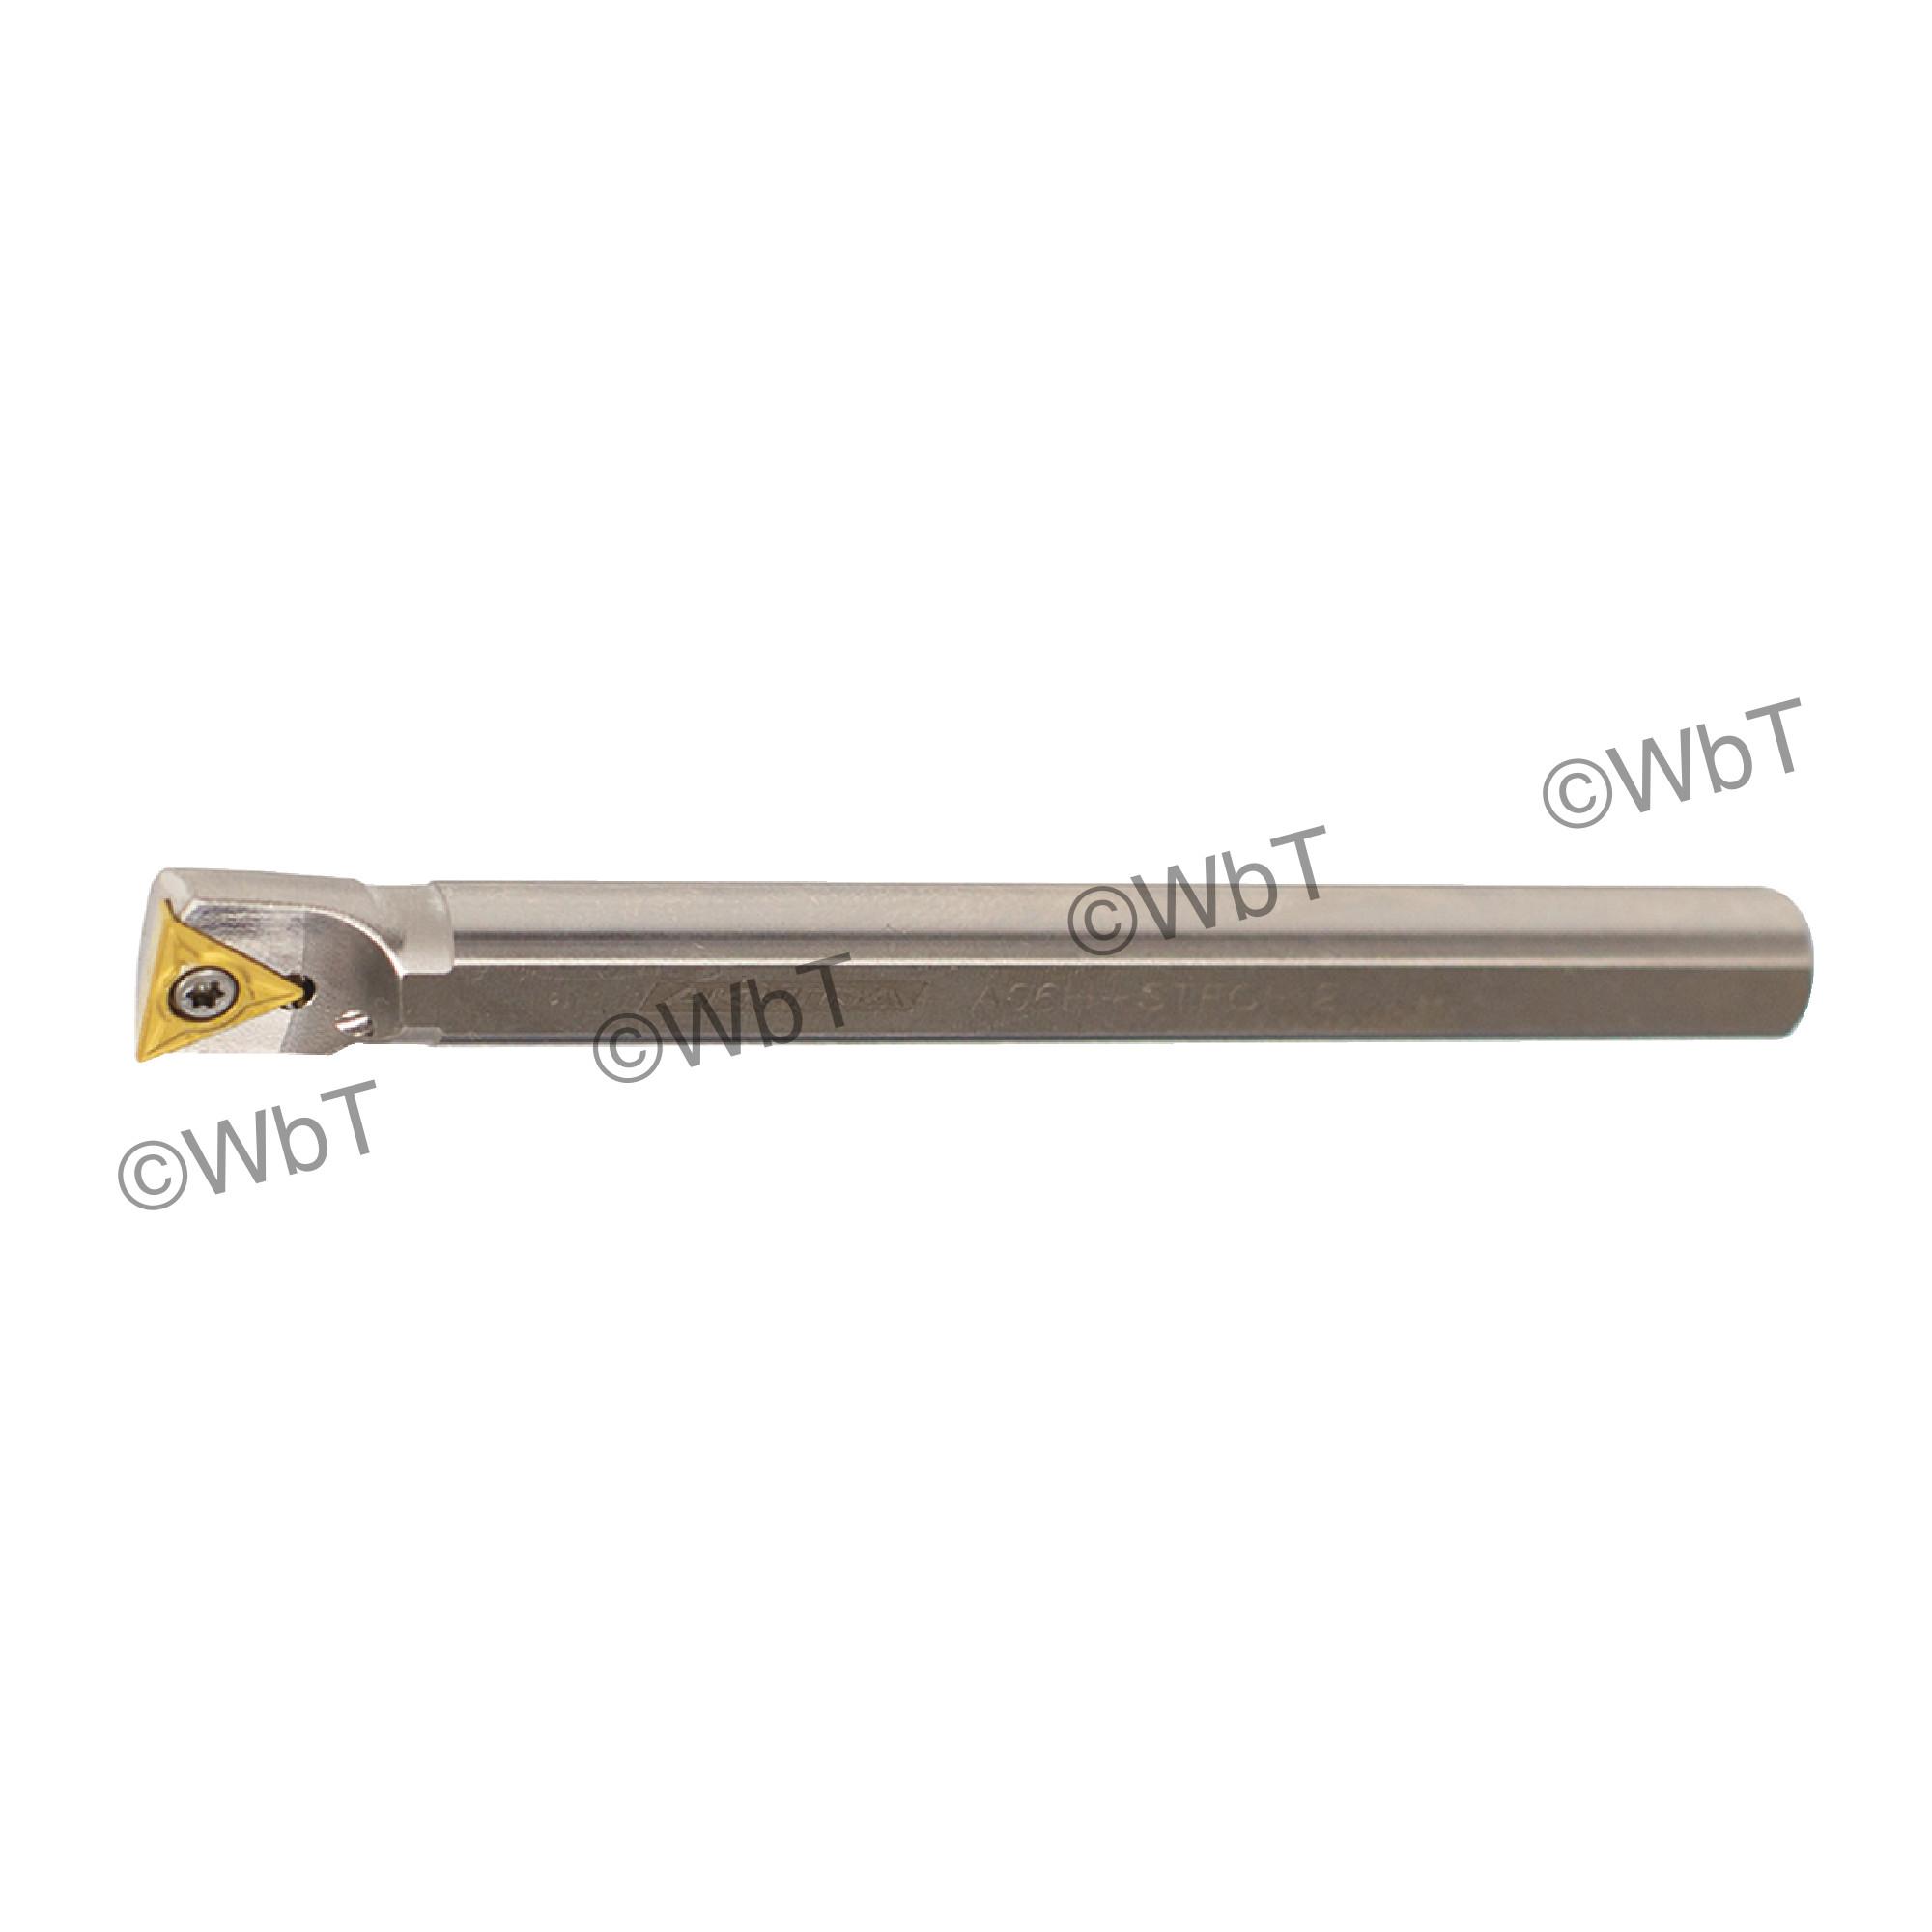 "AKUMA - A06H-STFCR-2 / Steel Boring Bar / 3/8"" Shank / TCMT2(1.5)_ / Cooalnt Thru / Right Hand"